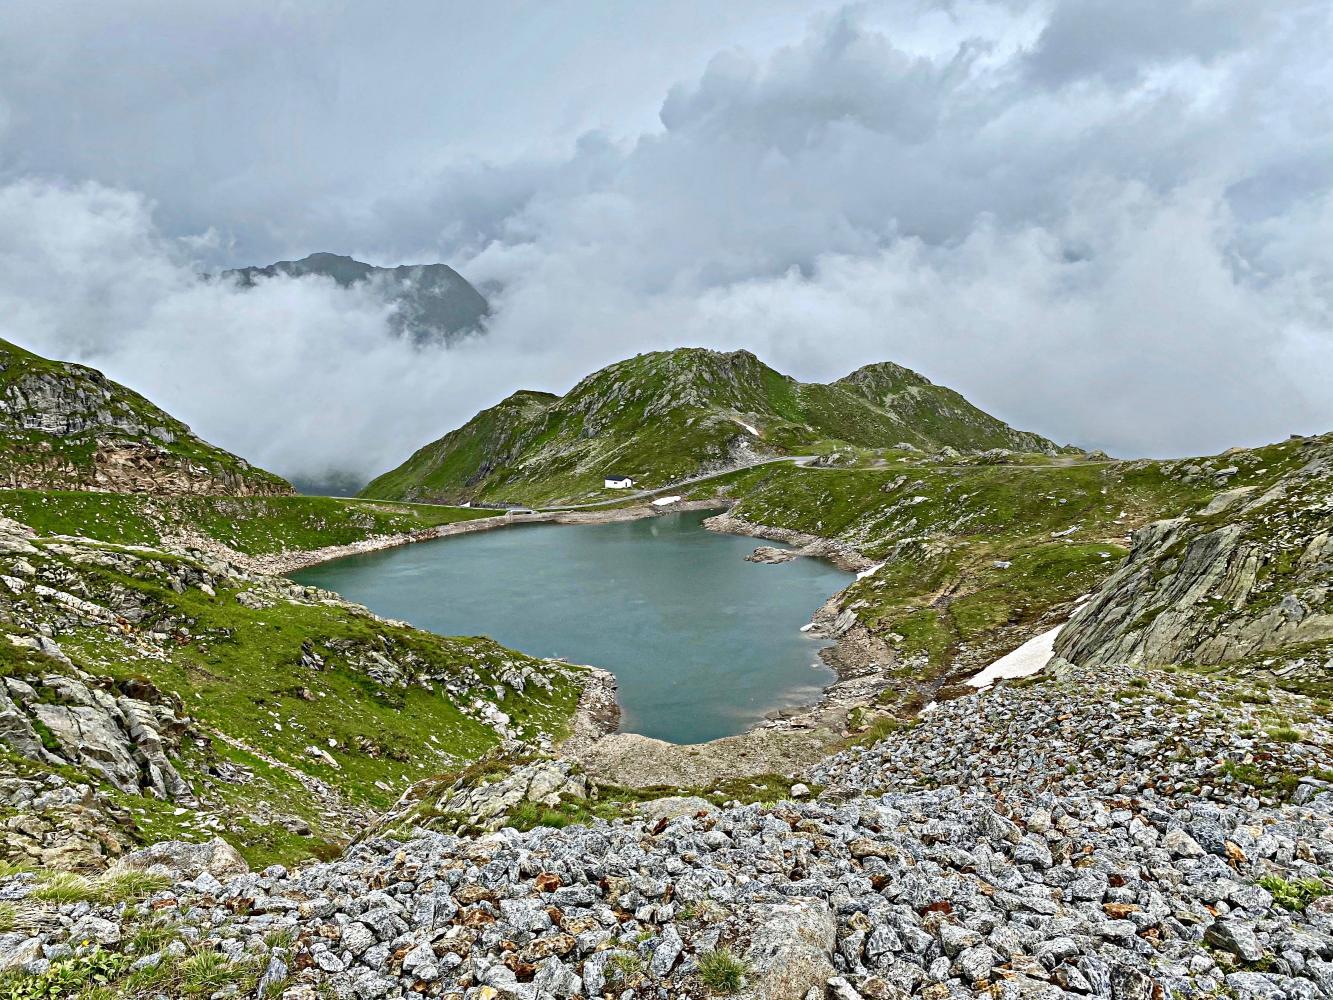 Lago del Naret, Switzerland - PJAMM Cycling - Climb of the Week